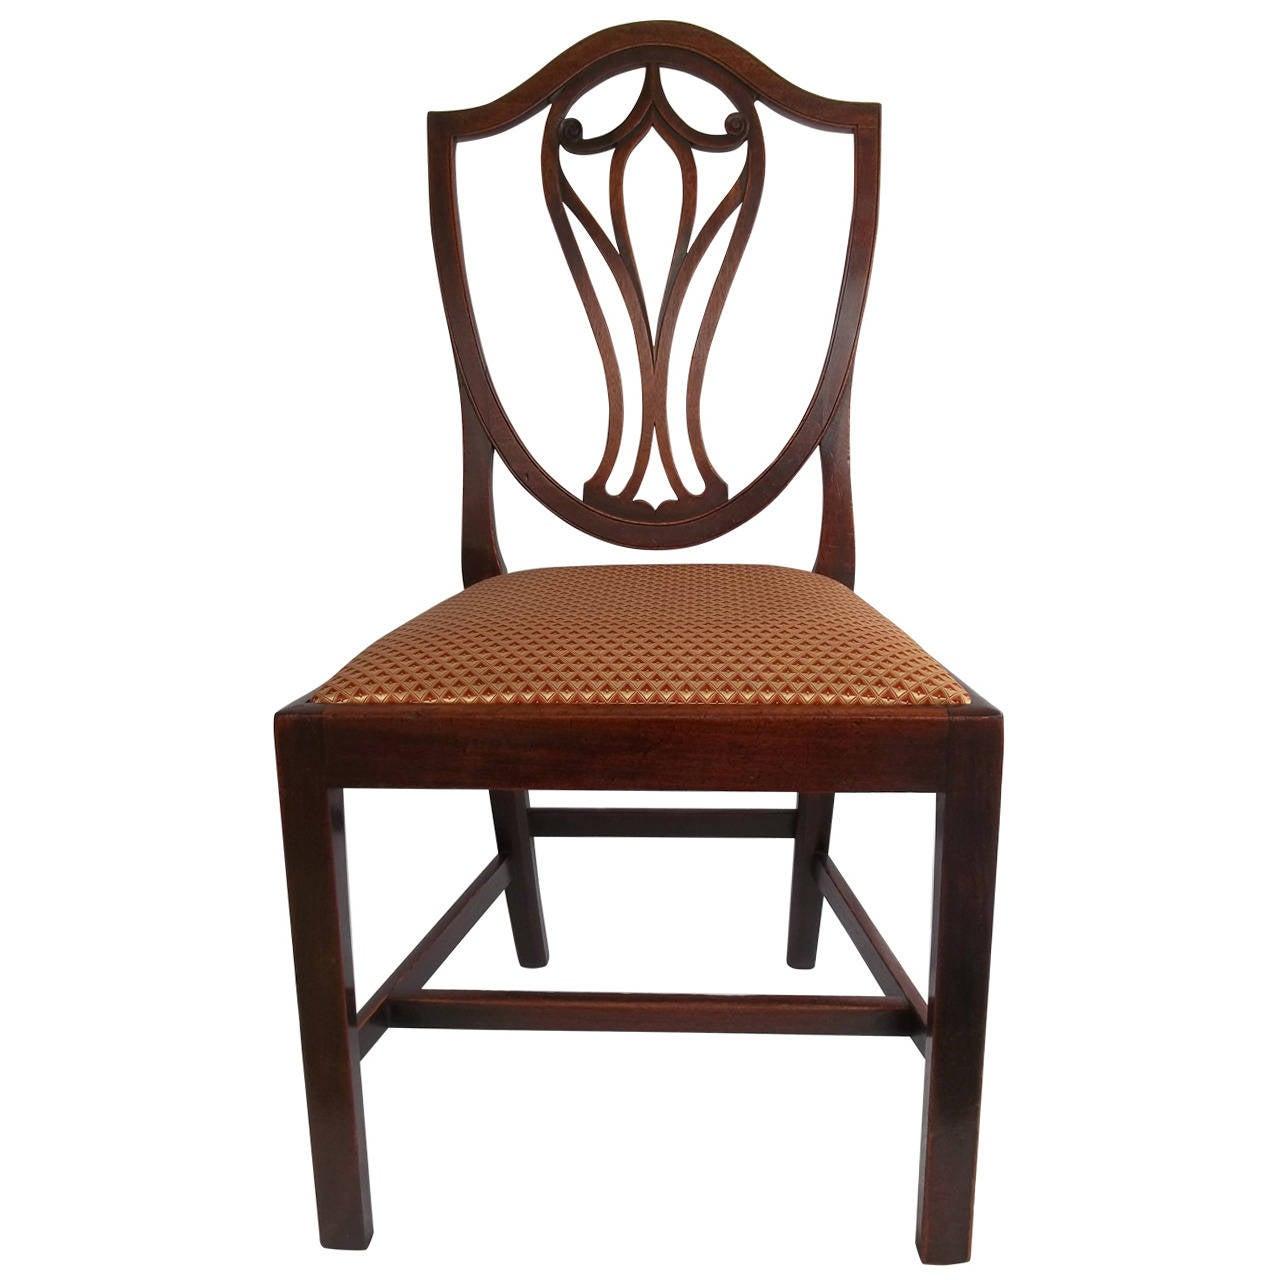 Elegant 18th Century Hepplewhite Side Chair in Mahogany, English circa 1785 For Sale